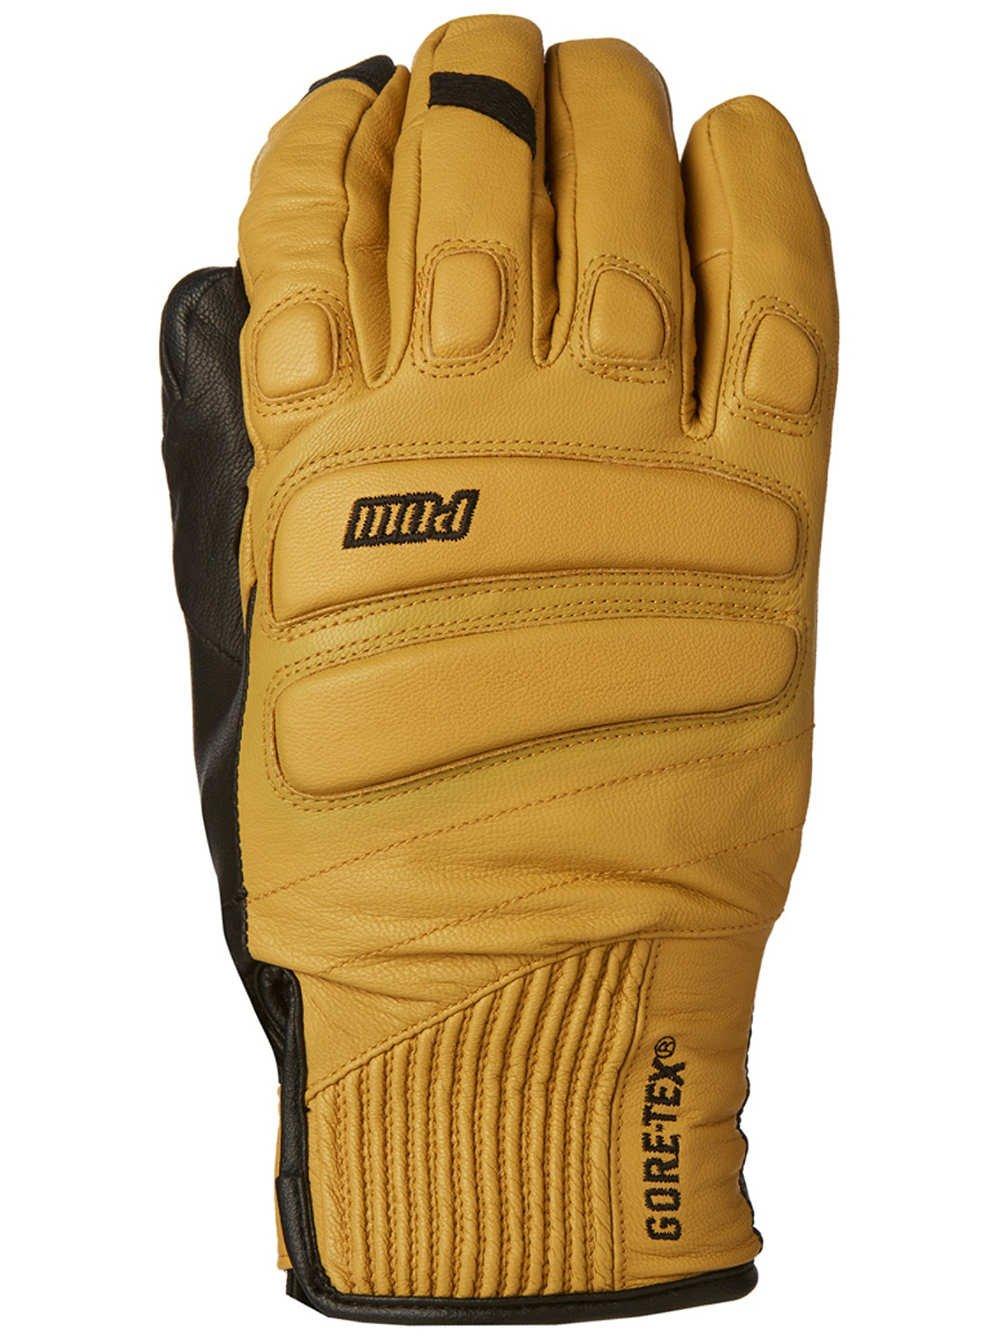 Pow Gloves頂点GTX Warm Glove B01J6RLSQ2  ナチュラル Medium